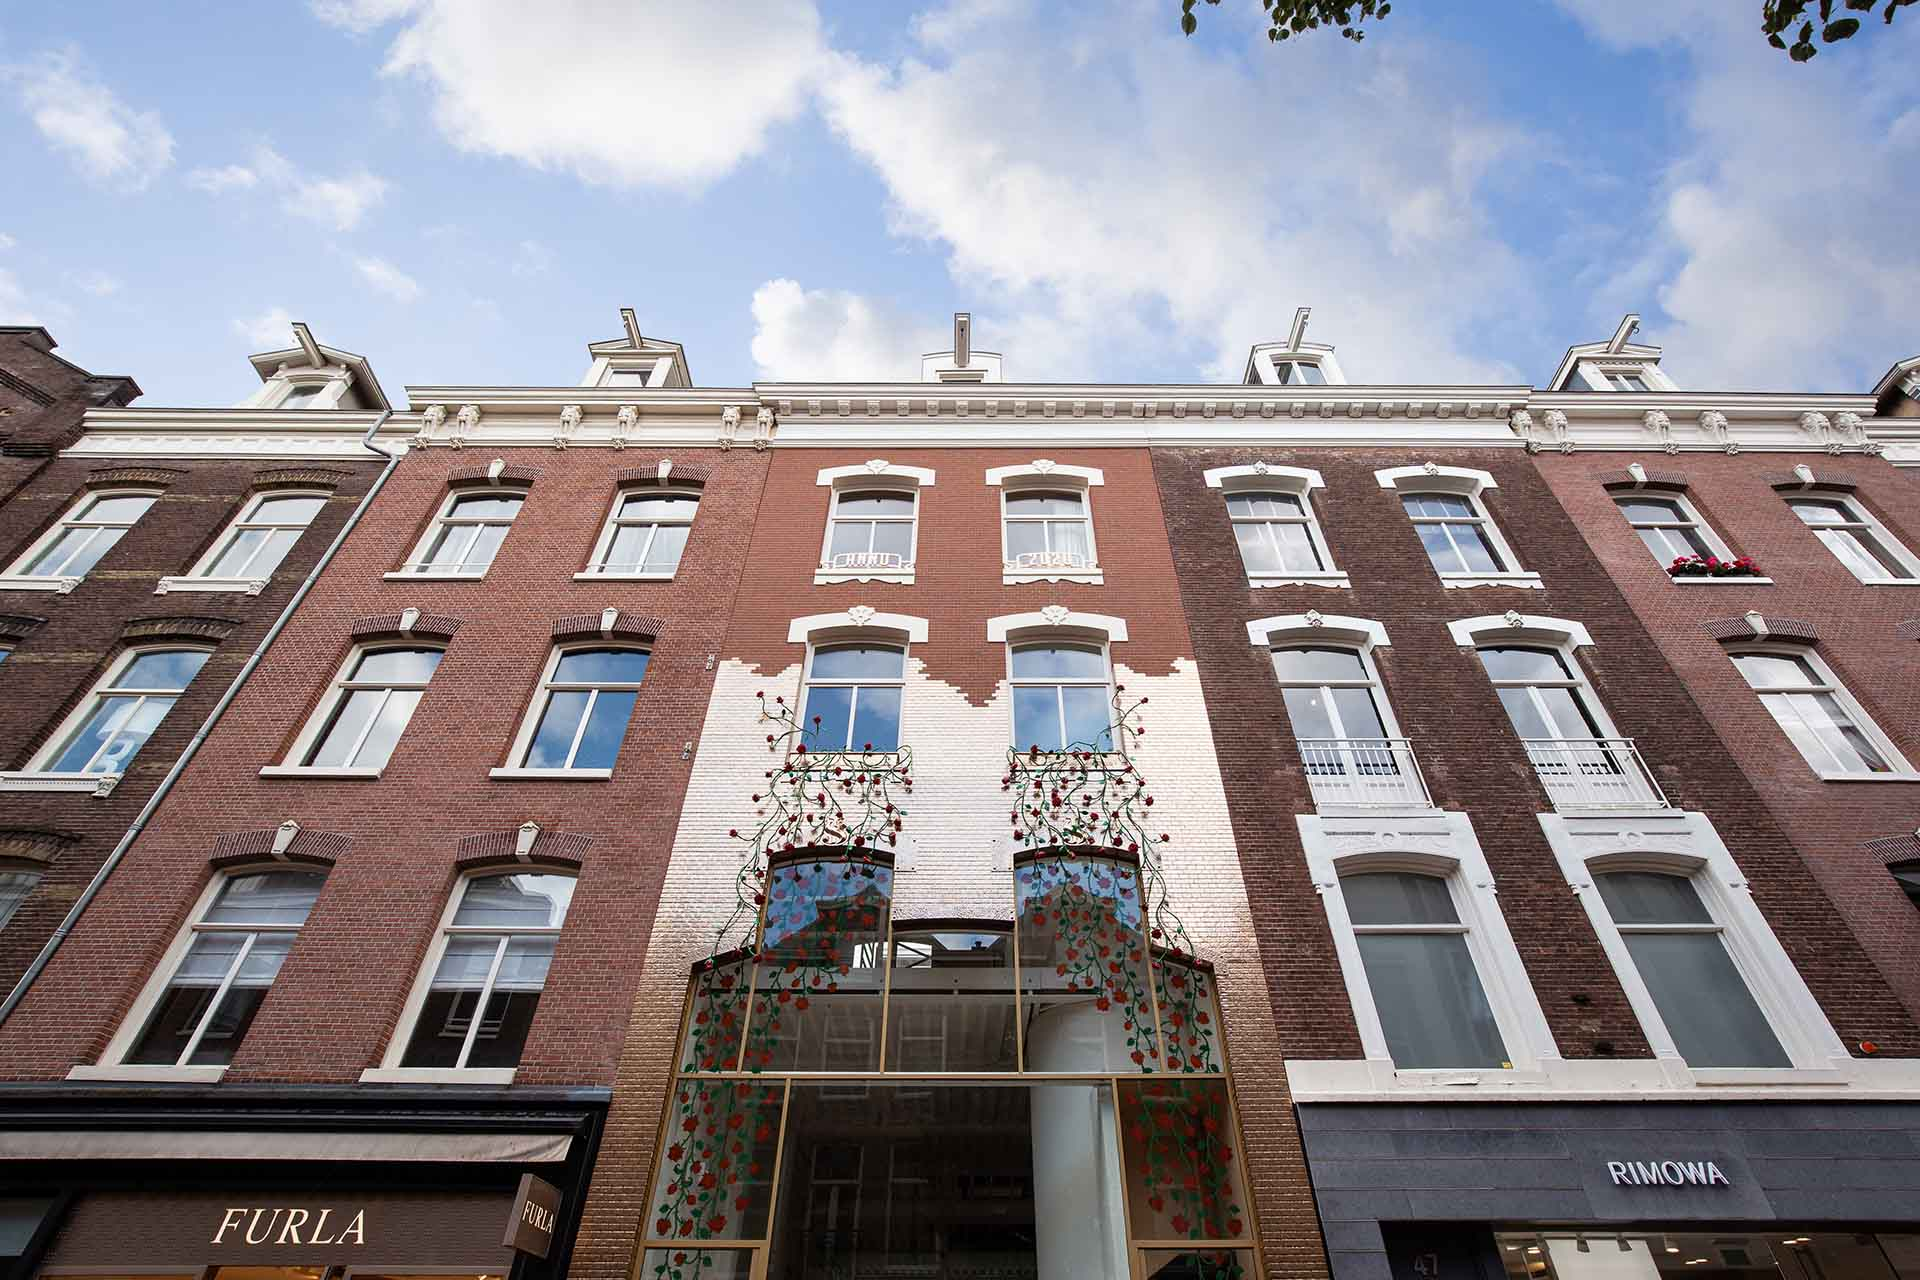 MHB-SL30-ISO-2020-PV-P.C.-Hooftstraat-45-Amsterdam-1-3